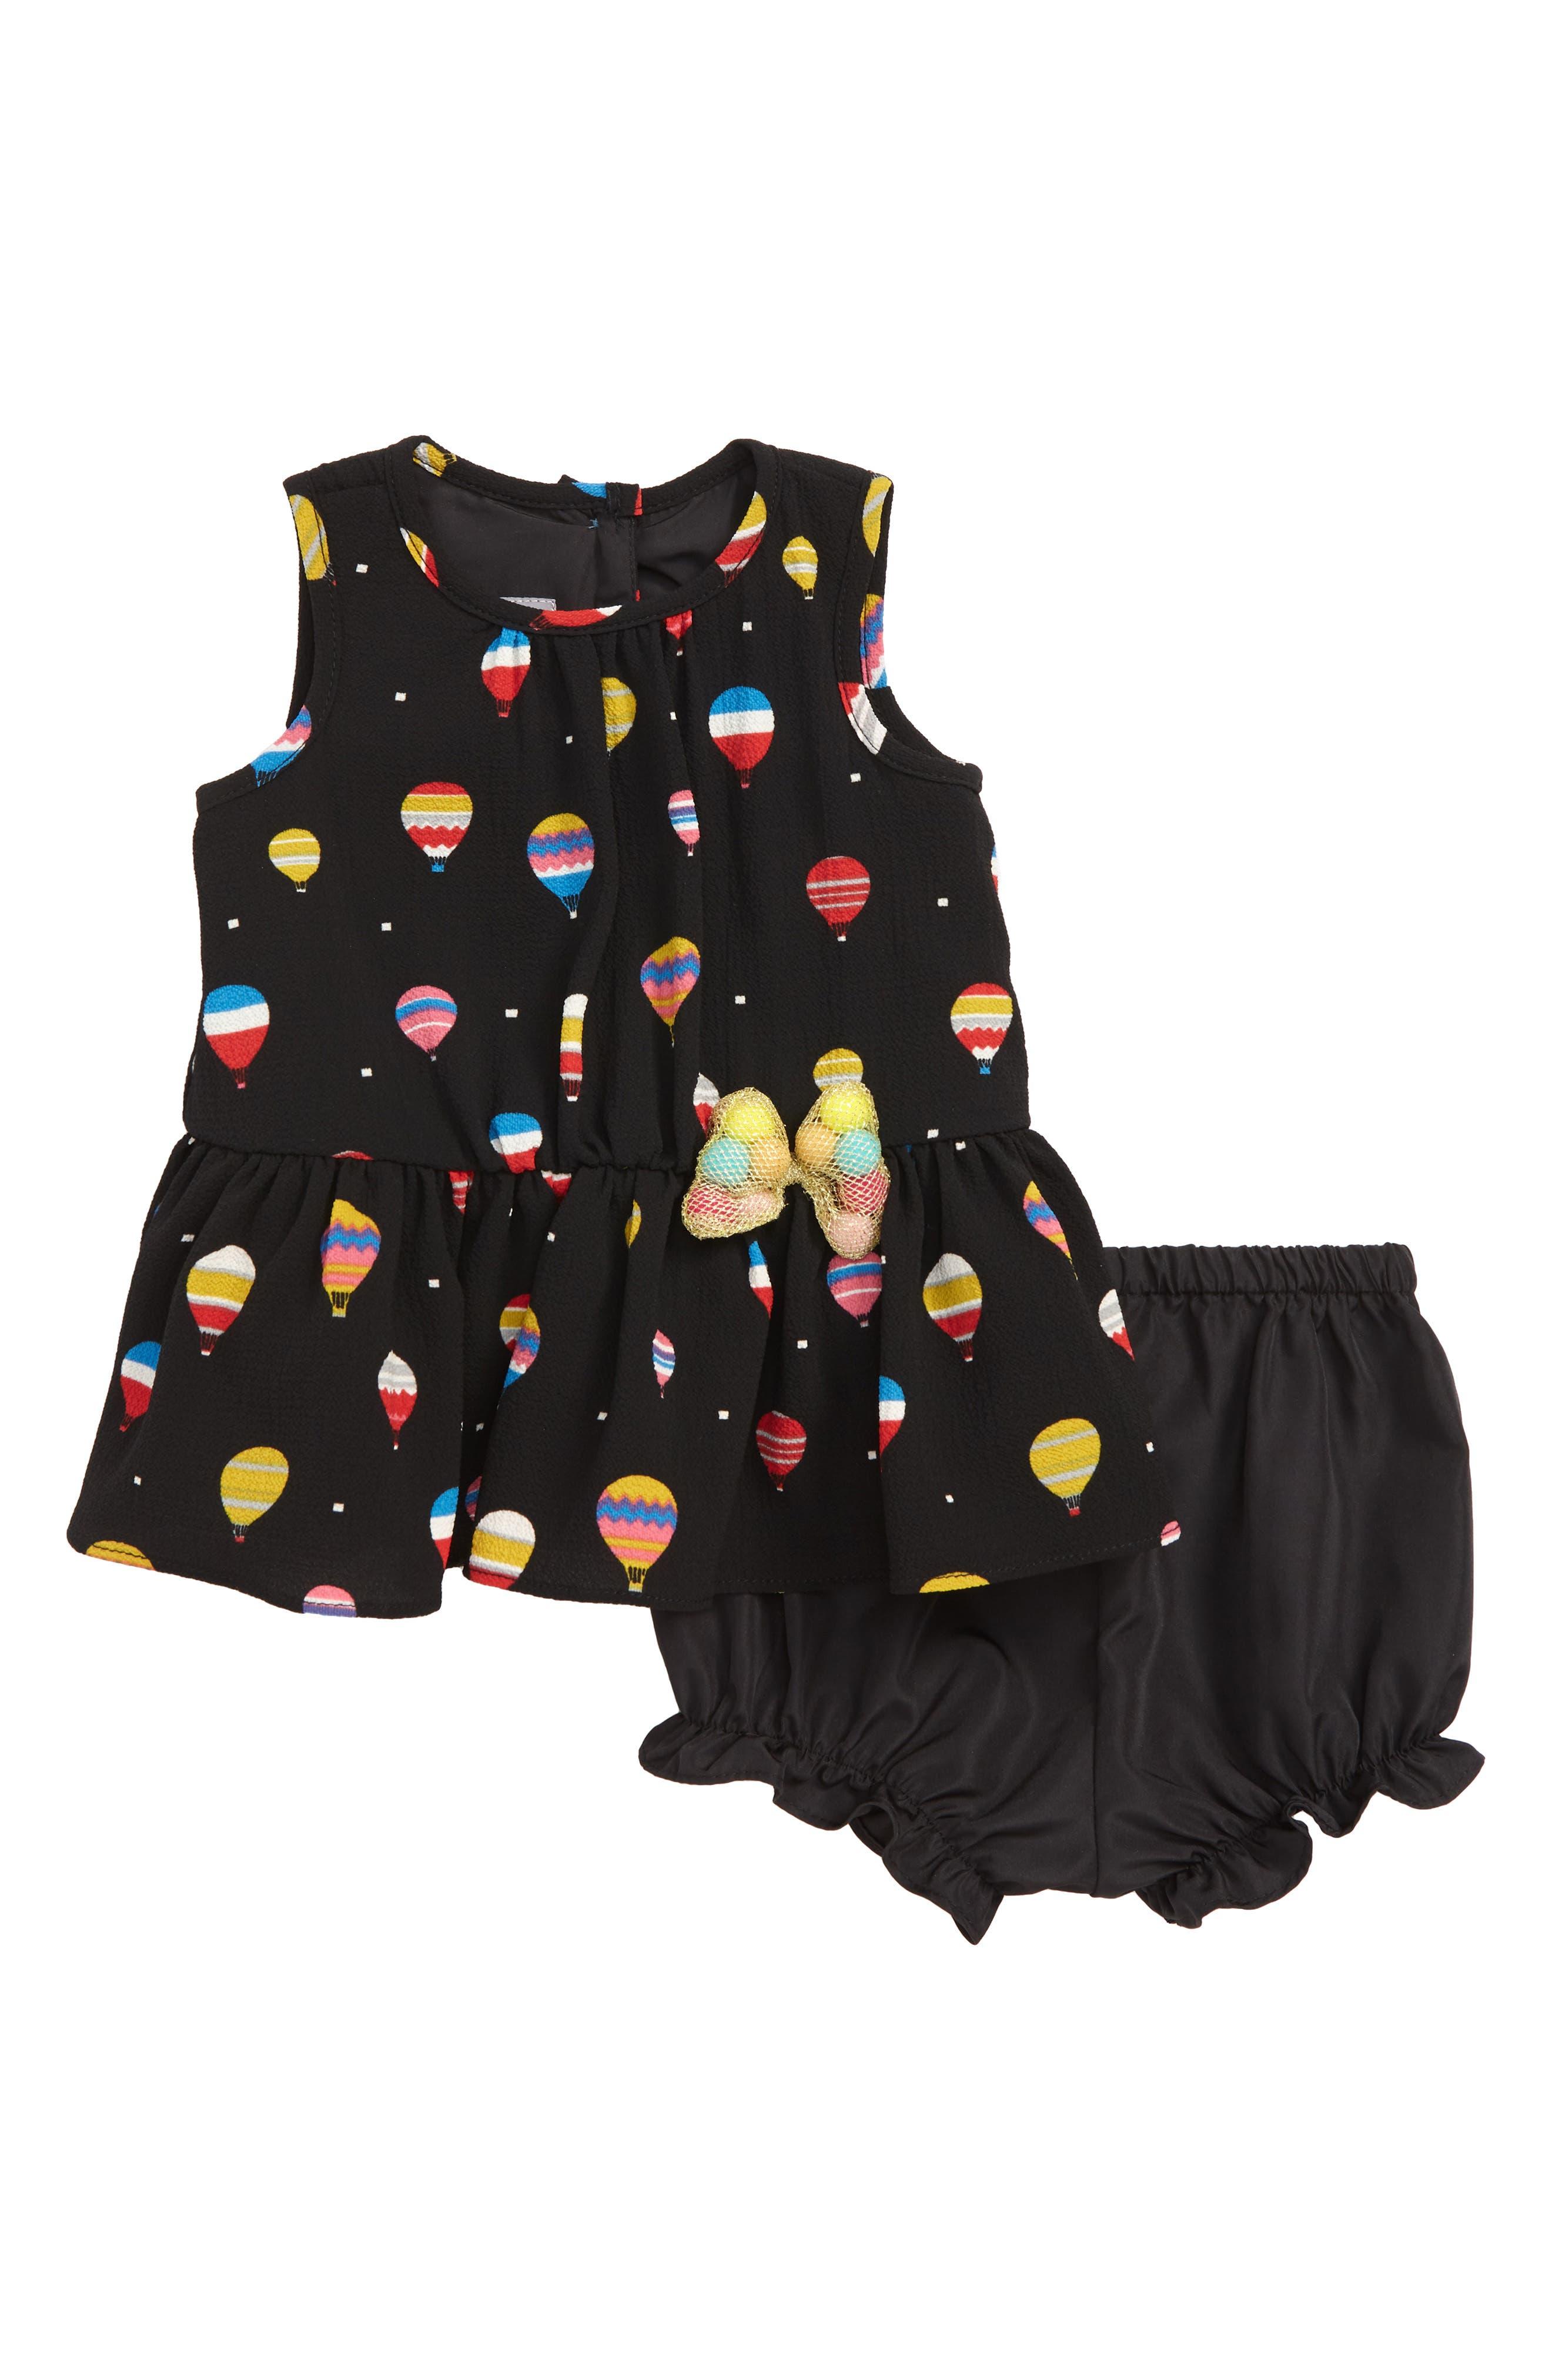 Hot Air Balloon Dress,                             Main thumbnail 1, color,                             BLACK